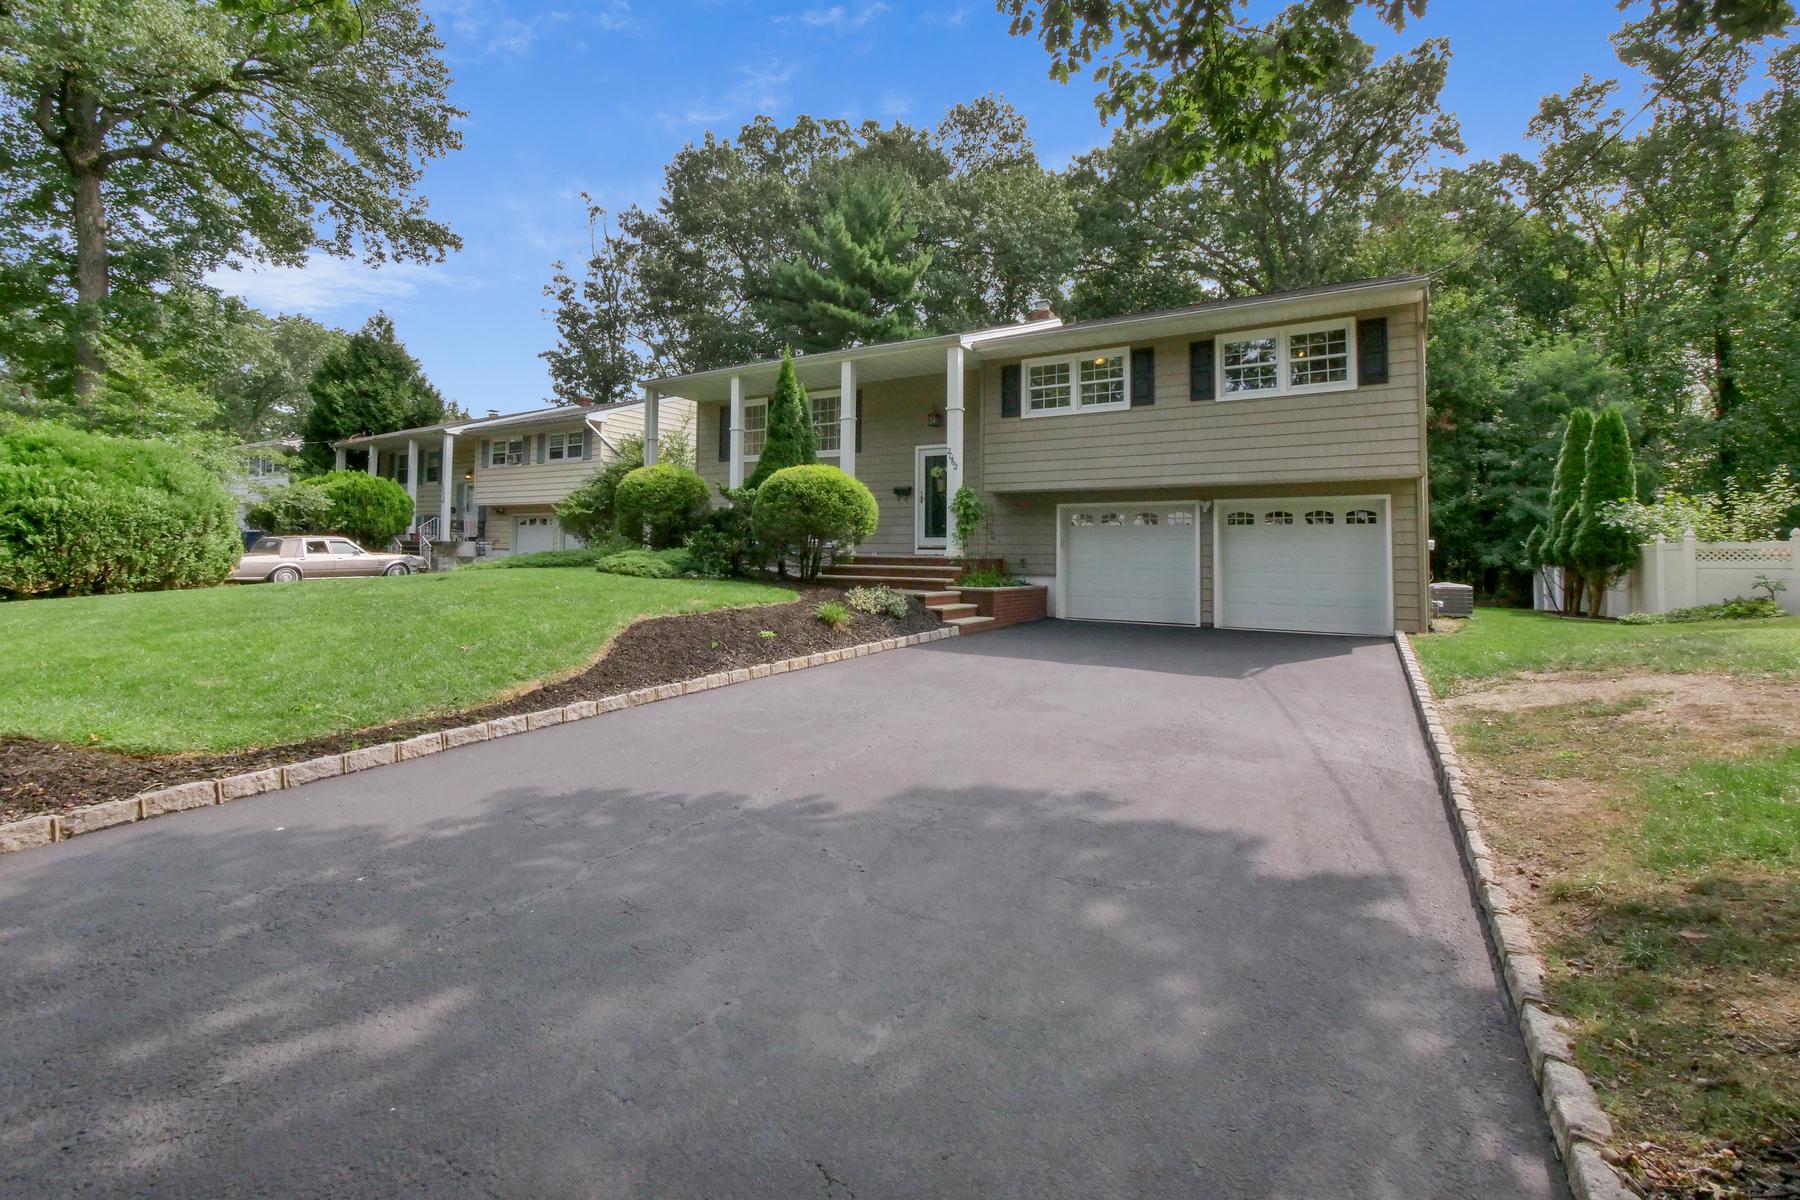 Single Family Homes для того Продажа на Cul De Sac Location in Desirable Maple Hill 2062 Princeton Avenue, Fanwood, Нью-Джерси 07023 Соединенные Штаты